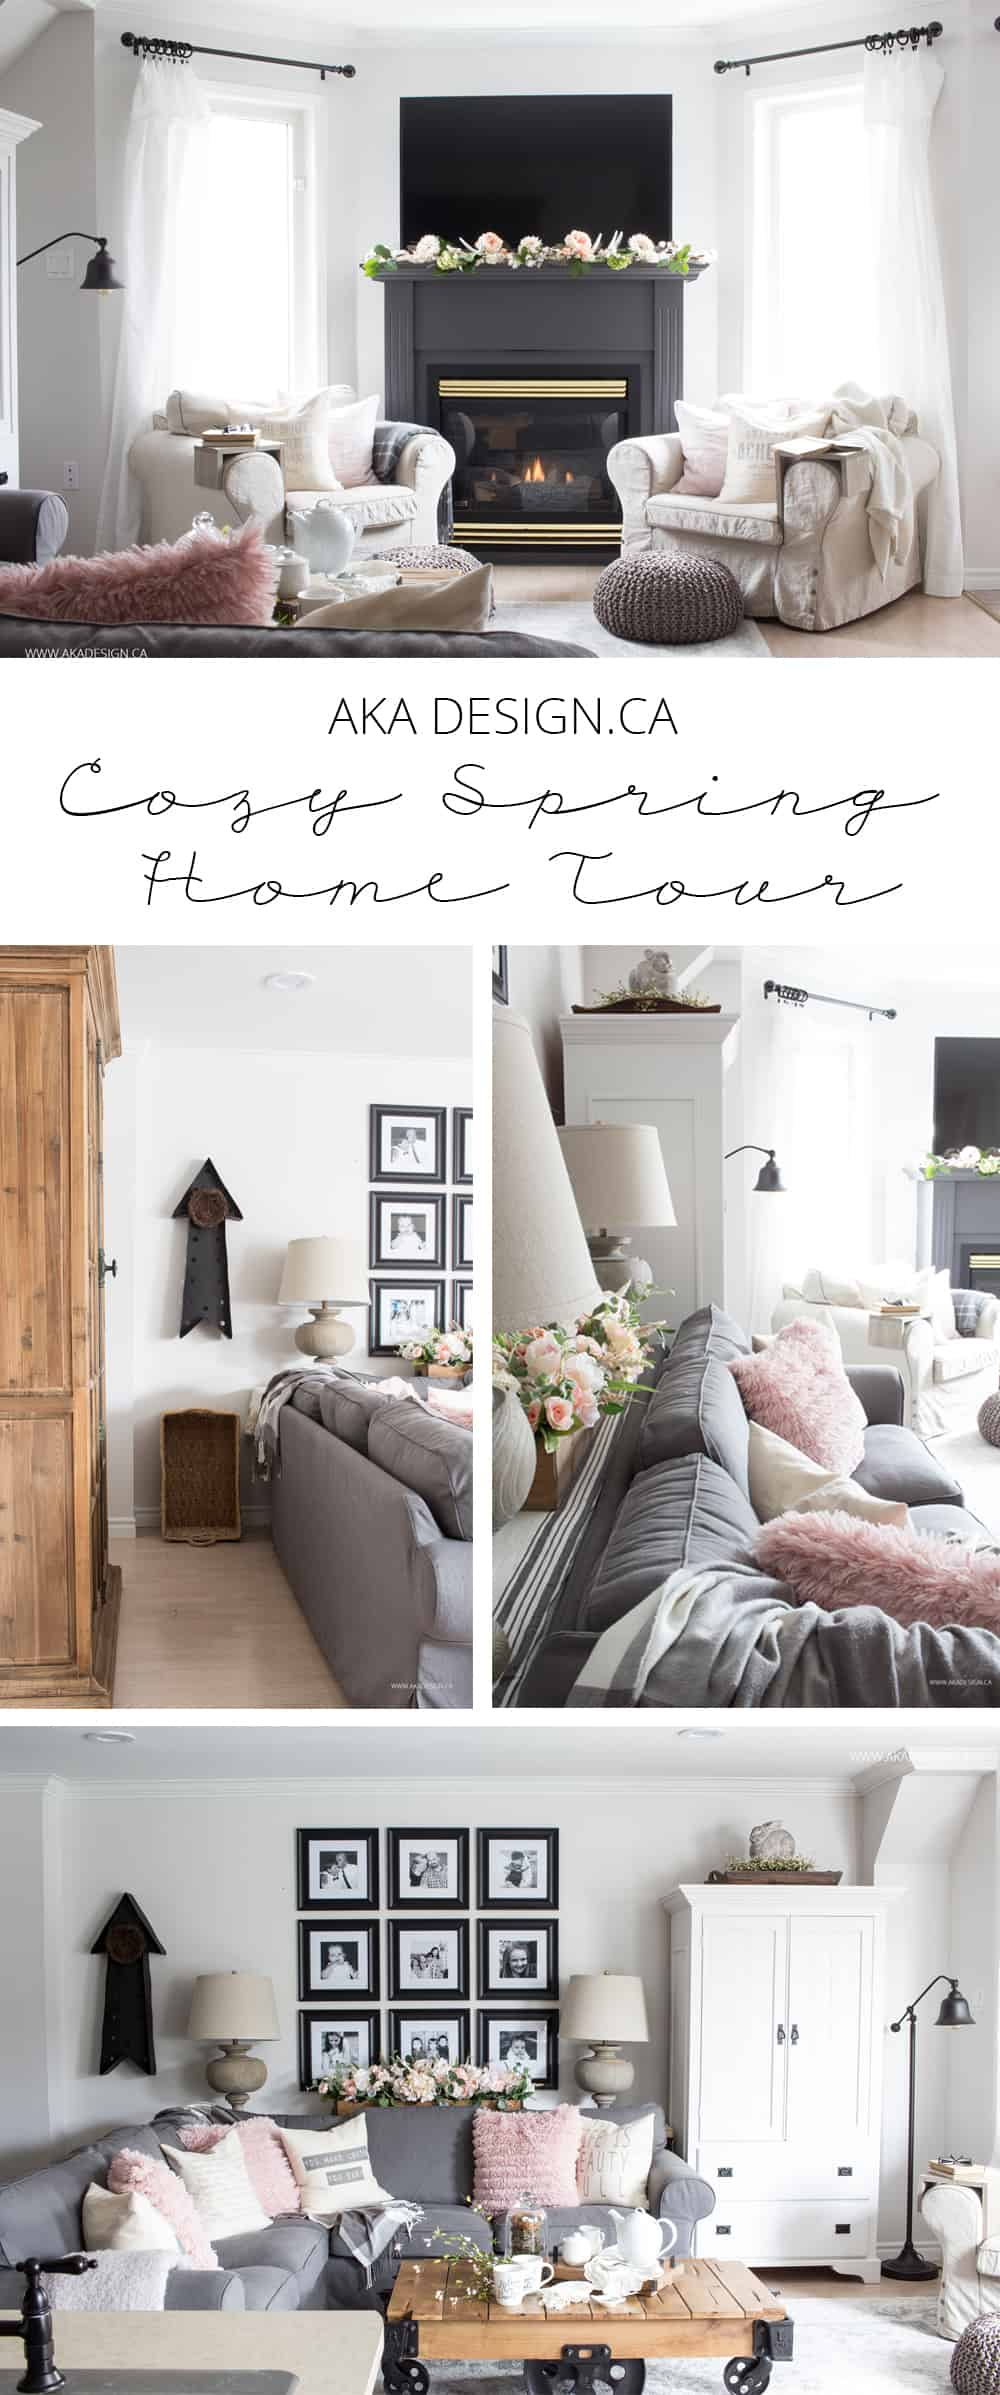 Cozy Spring Home Tour Part 1 Home Decorators Catalog Best Ideas of Home Decor and Design [homedecoratorscatalog.us]